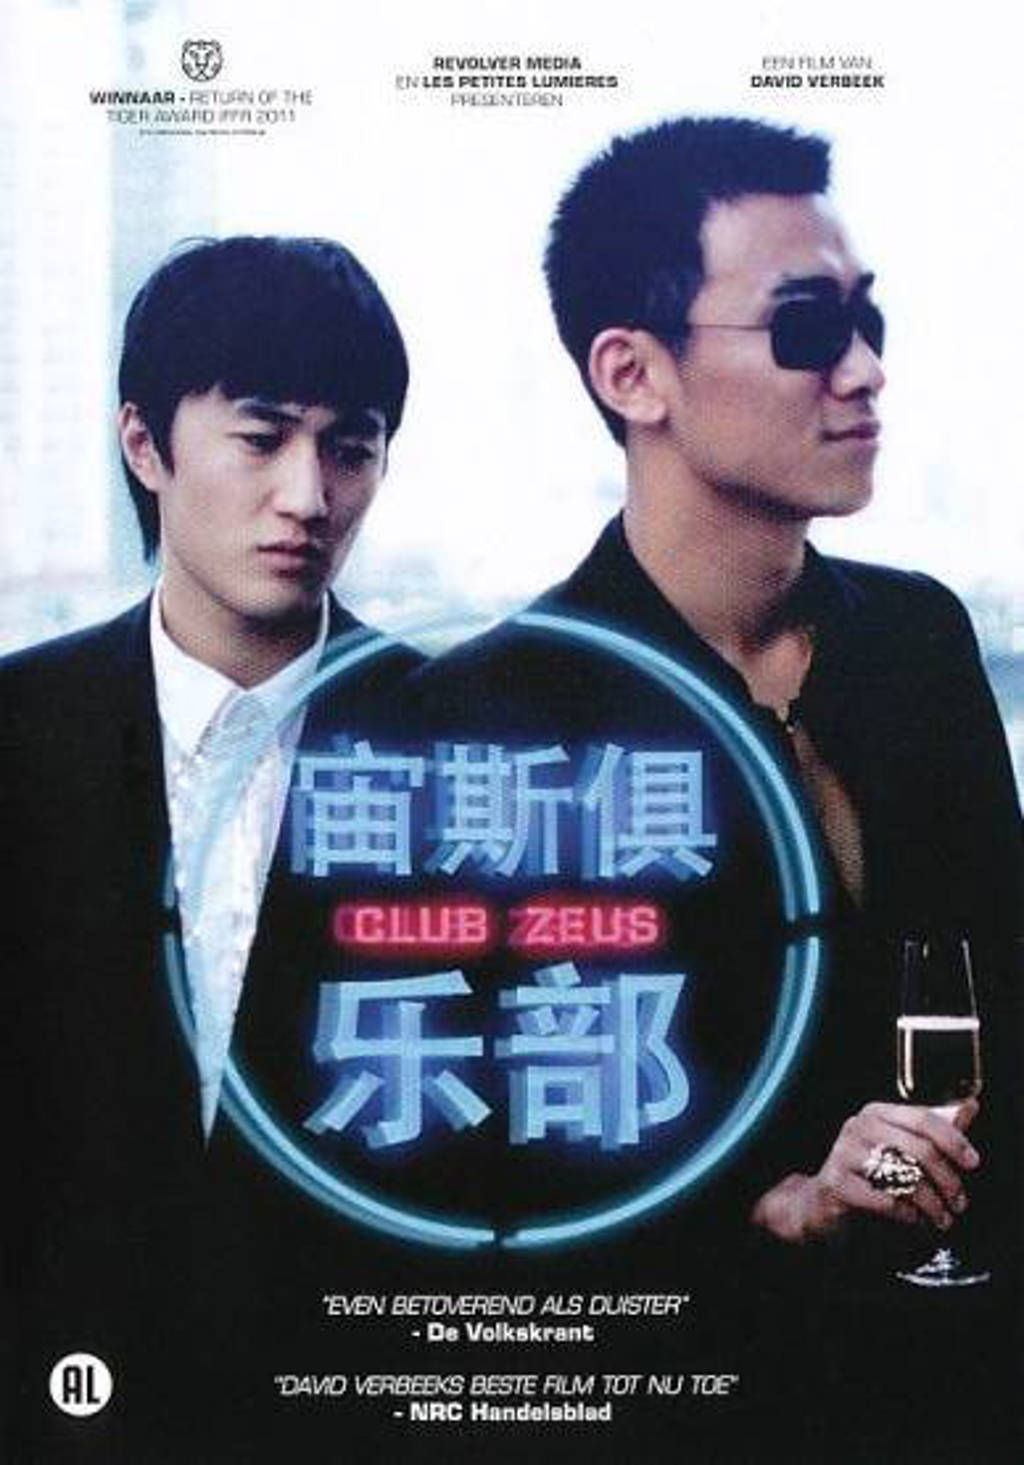 Club zeus (DVD)